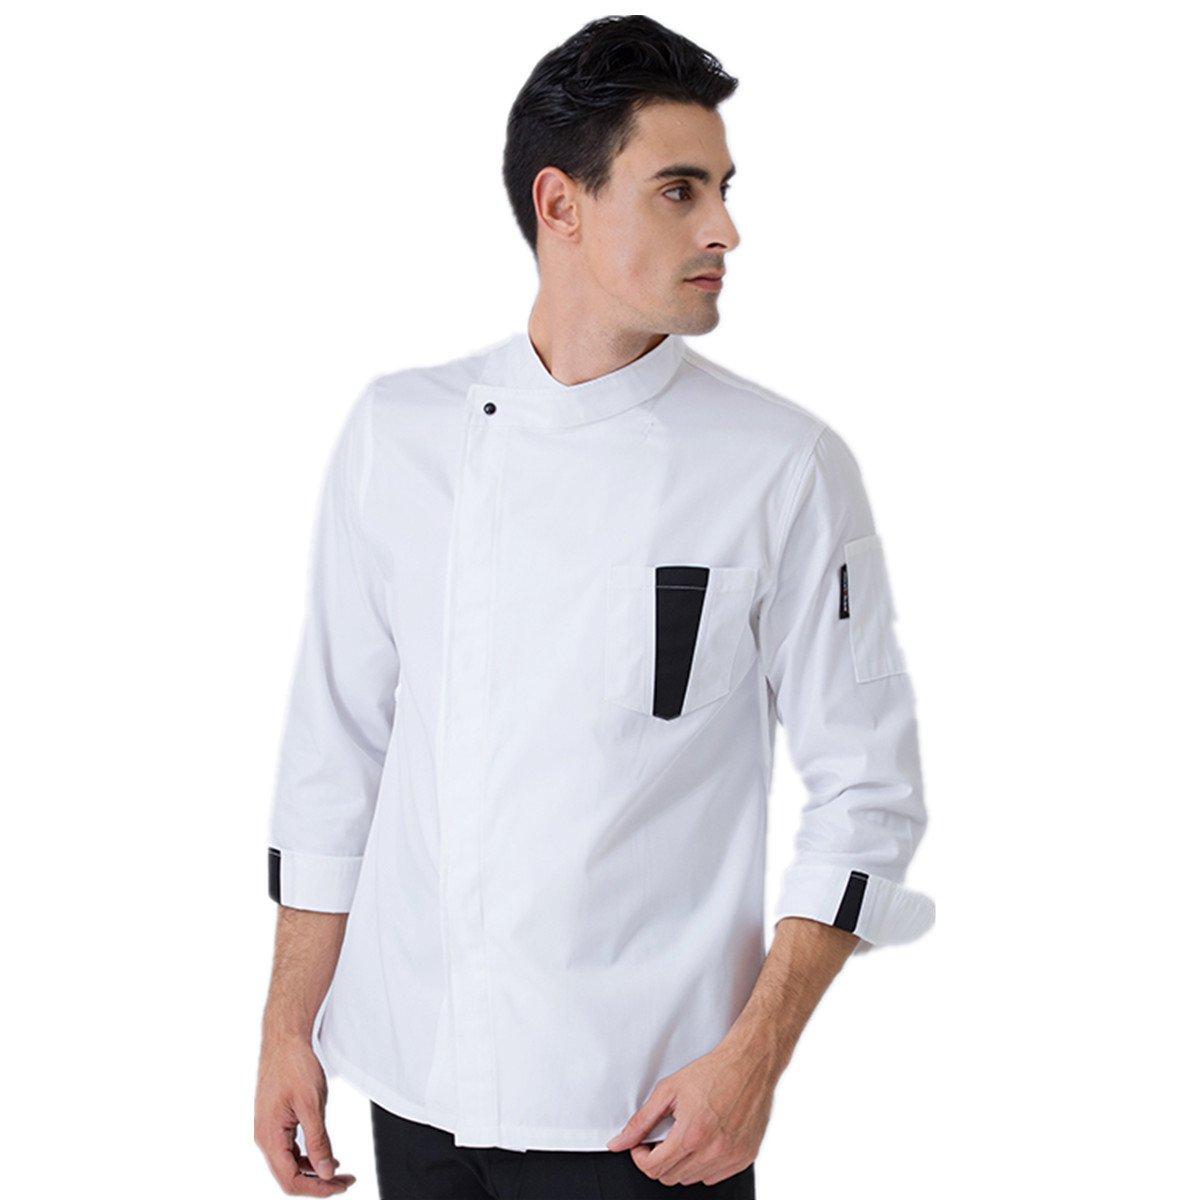 XINFU Chef's Uniform White Long-Sleeve Hotel Western Restaurant Chef Jacket French Underarm Breathable Chef Coat